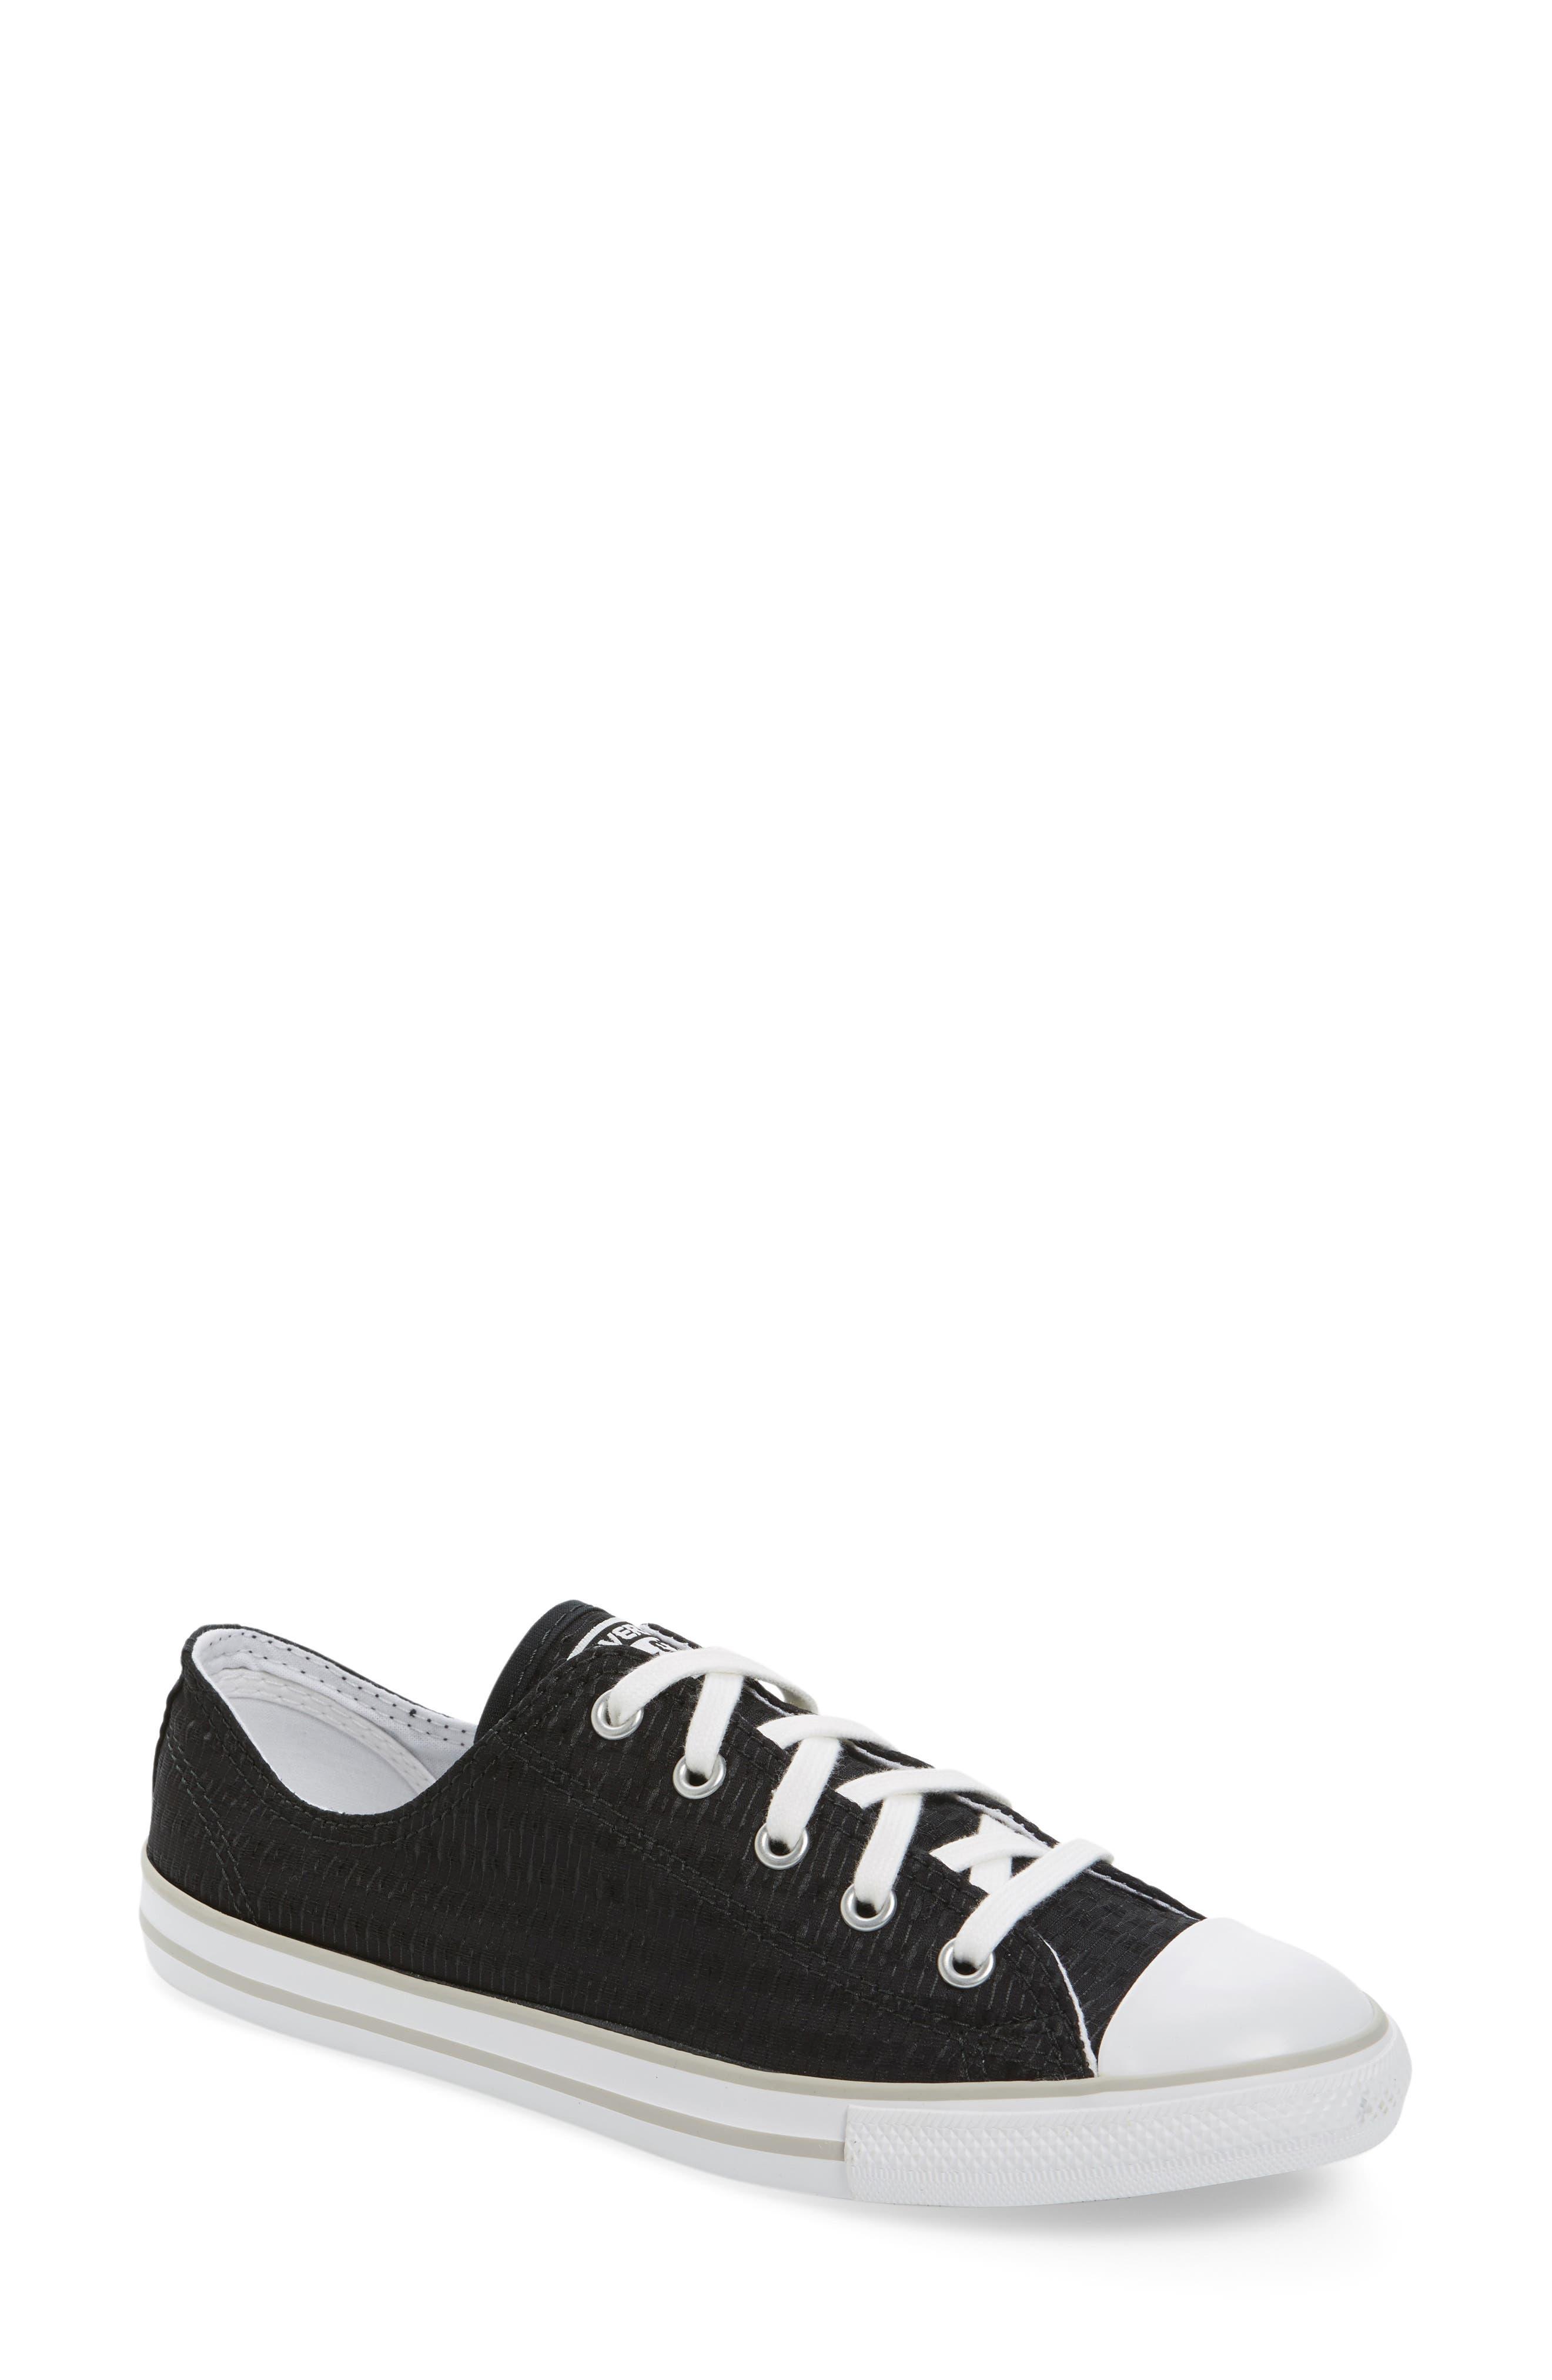 Main Image - Chuck Taylor® All Star® Dainty Low Top Sneaker (Women)